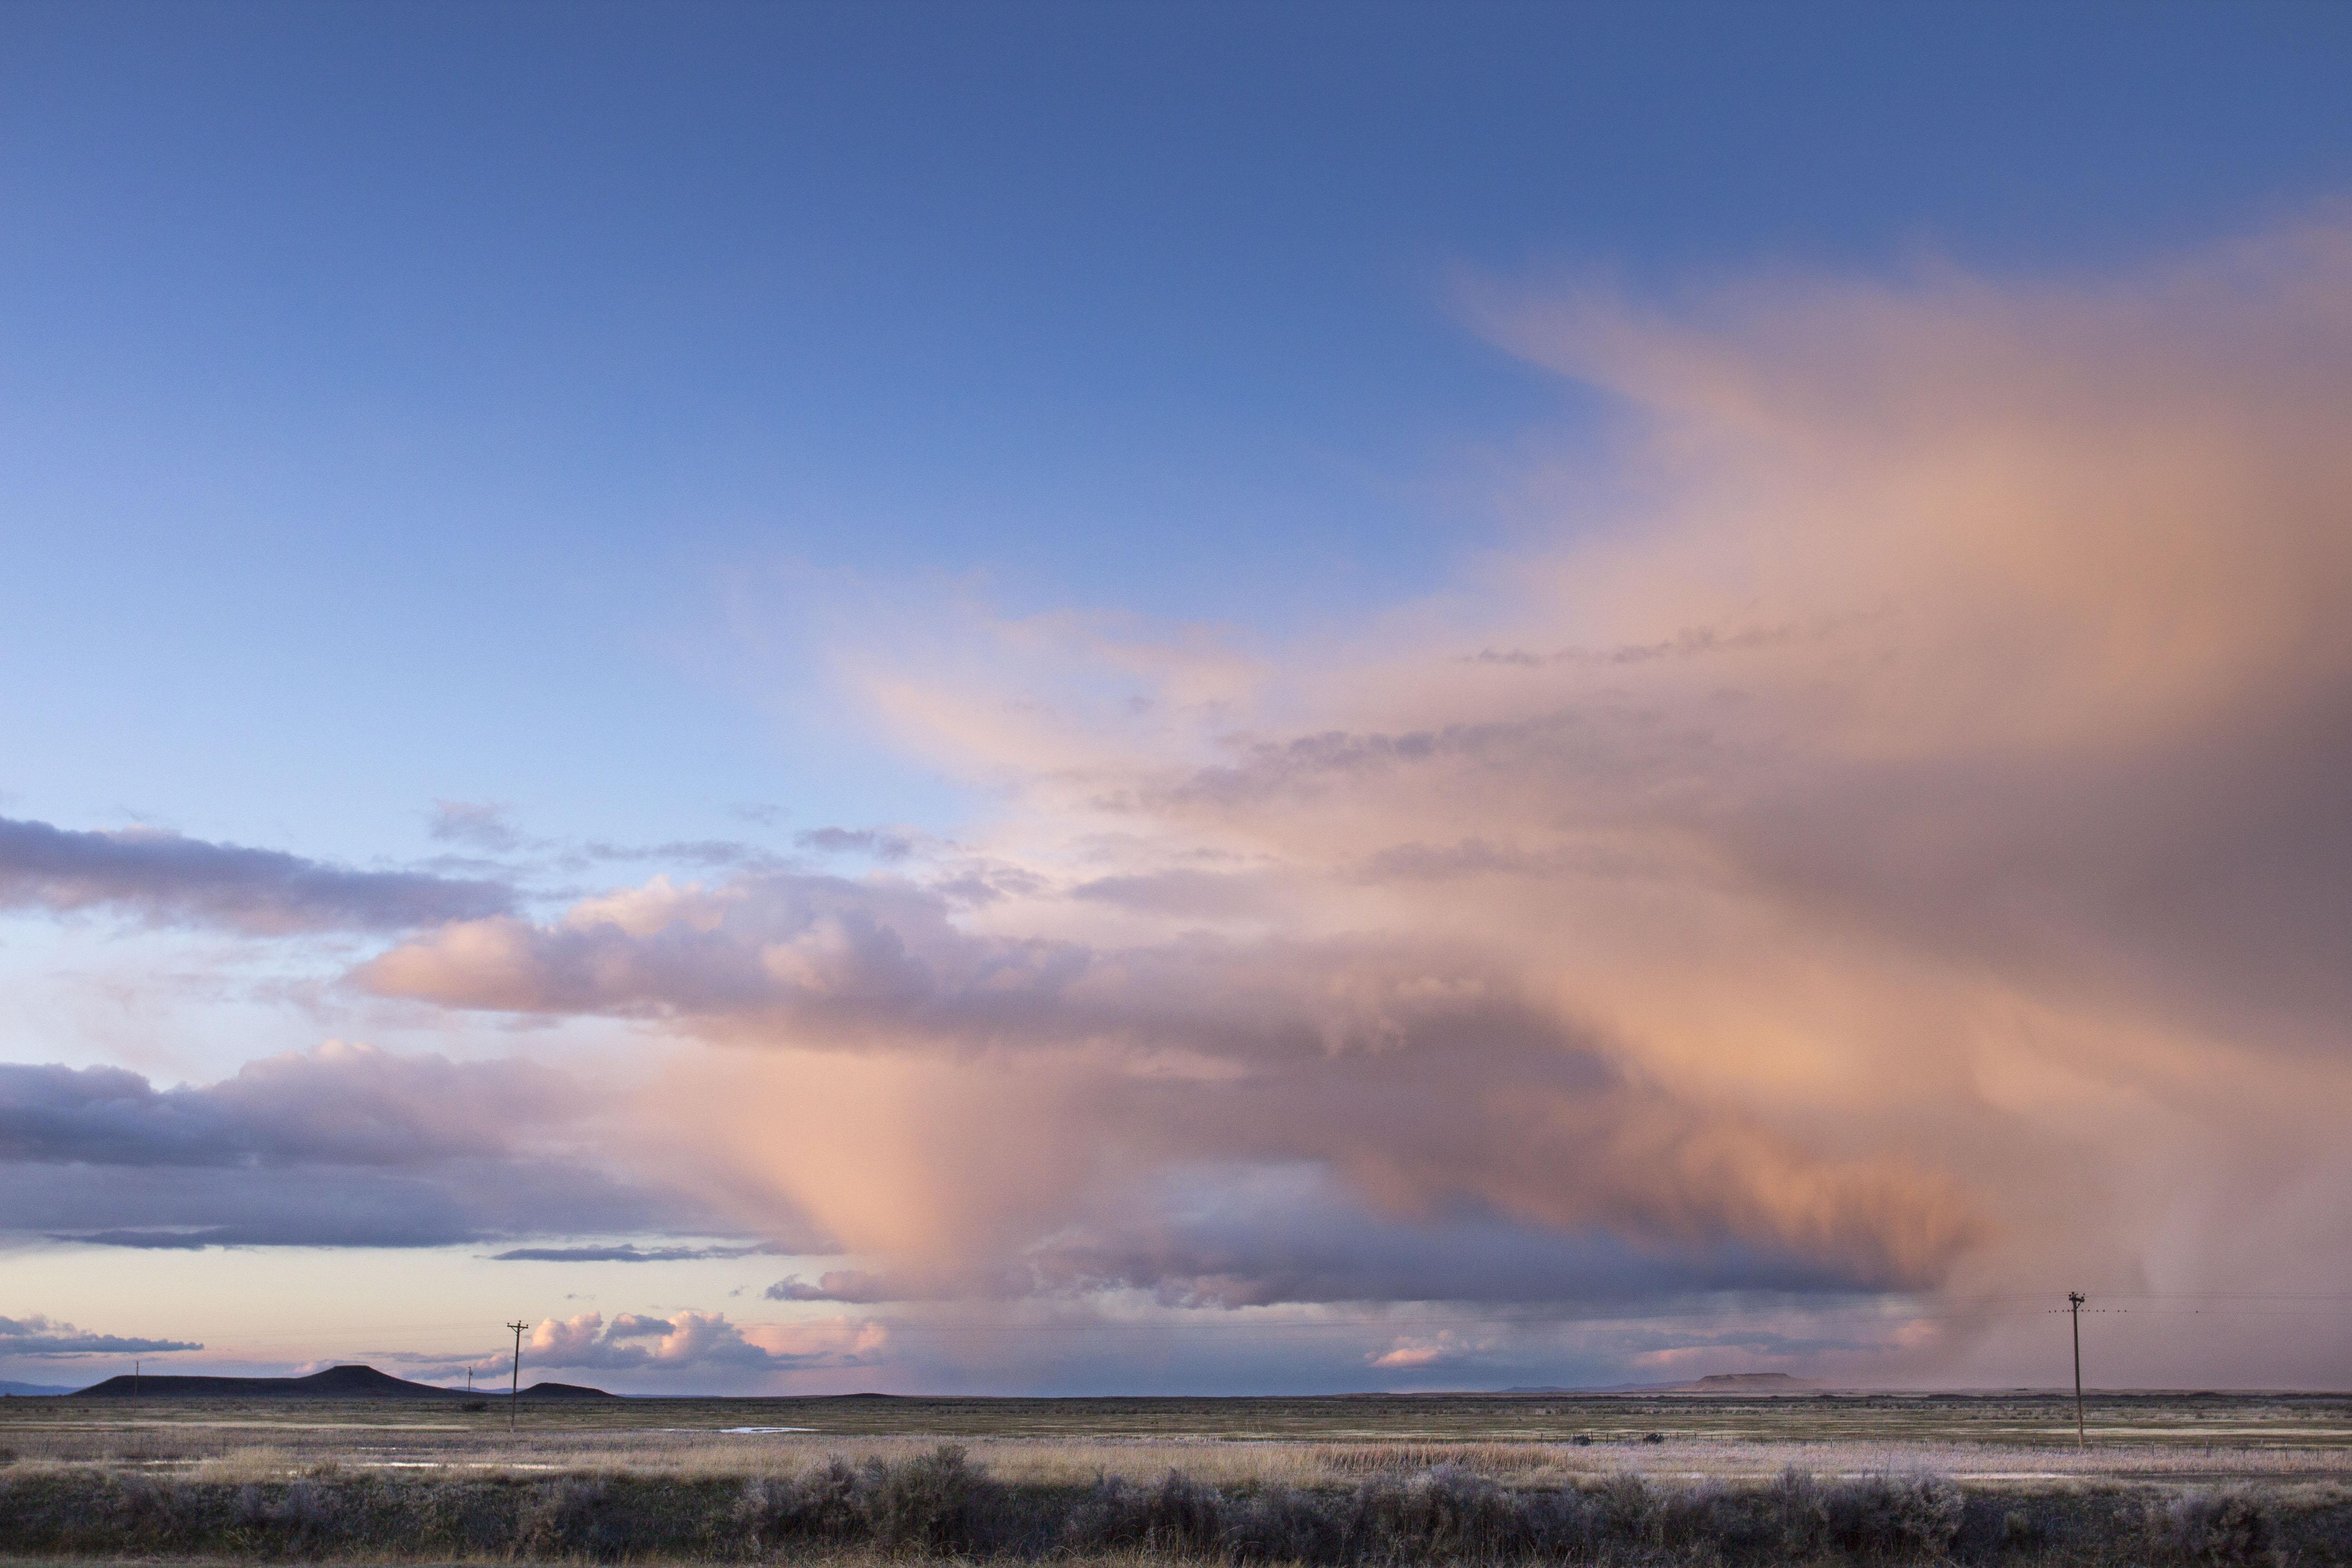 Storm clouds eastern Oregon, Storm, Sky, Sunset, #ThroughHerLens, HQ Photo